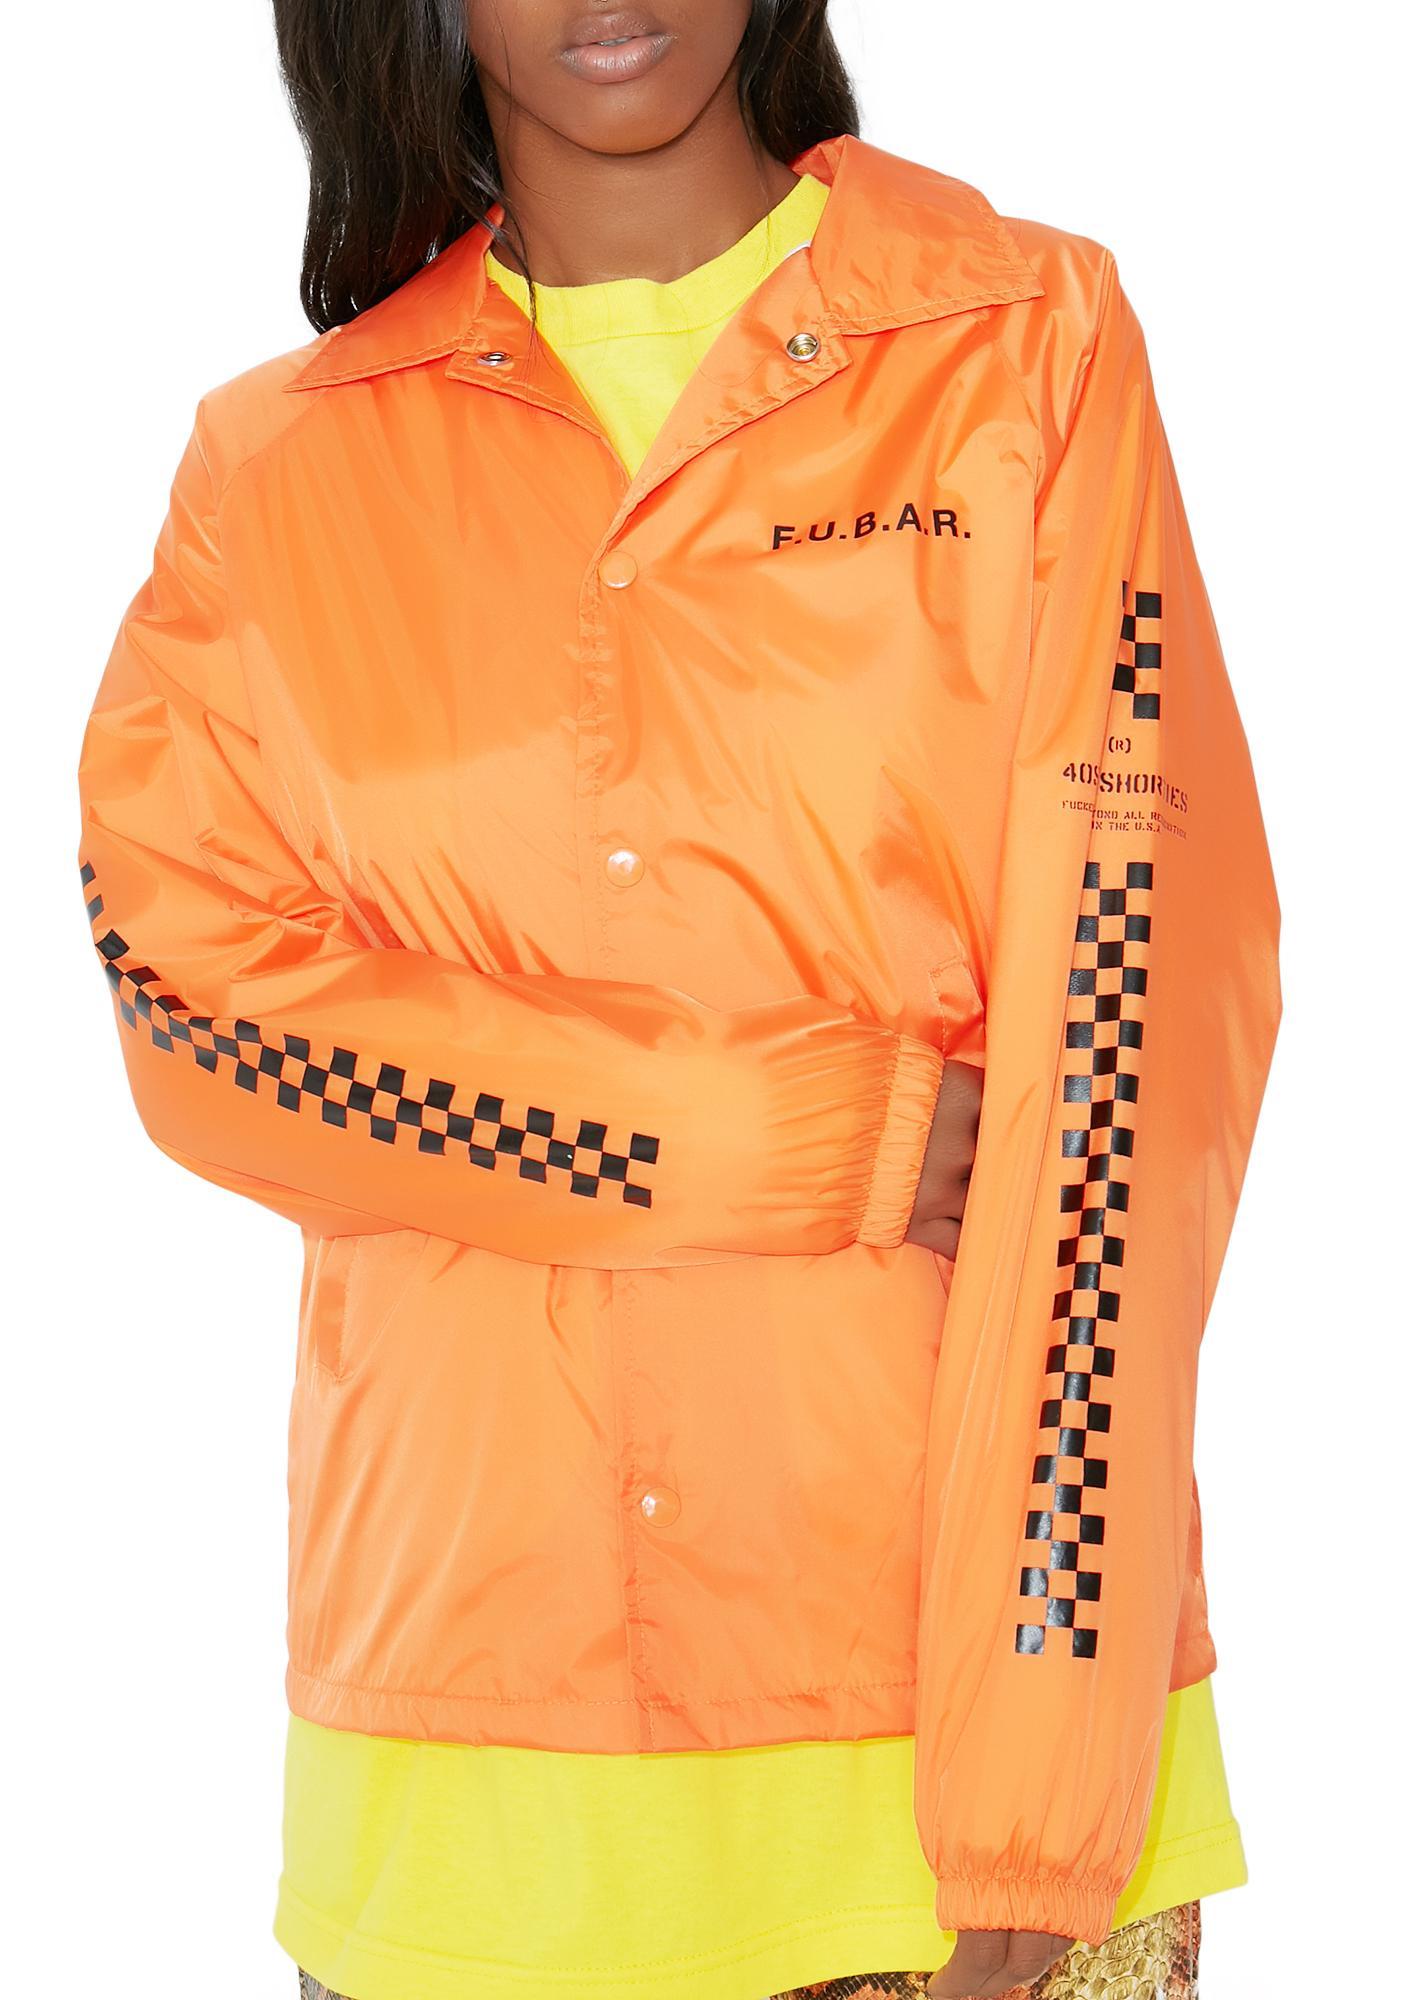 40s & Shorties F.U.B.A.R. Coaches Jacket